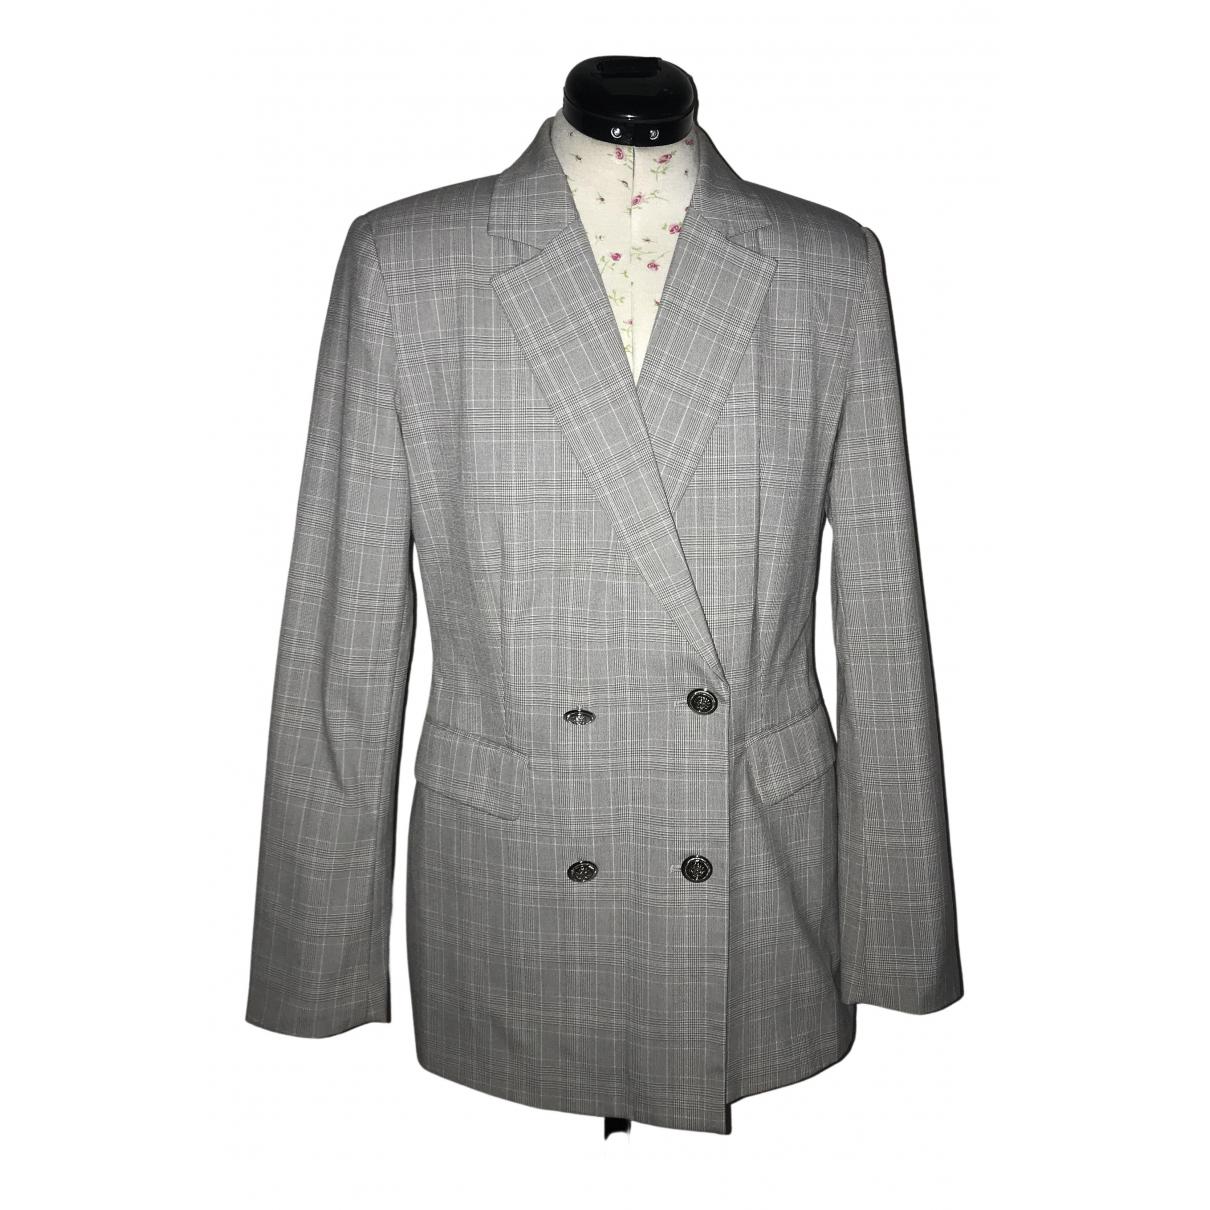 Zara \N Jacke in  Grau Polyester